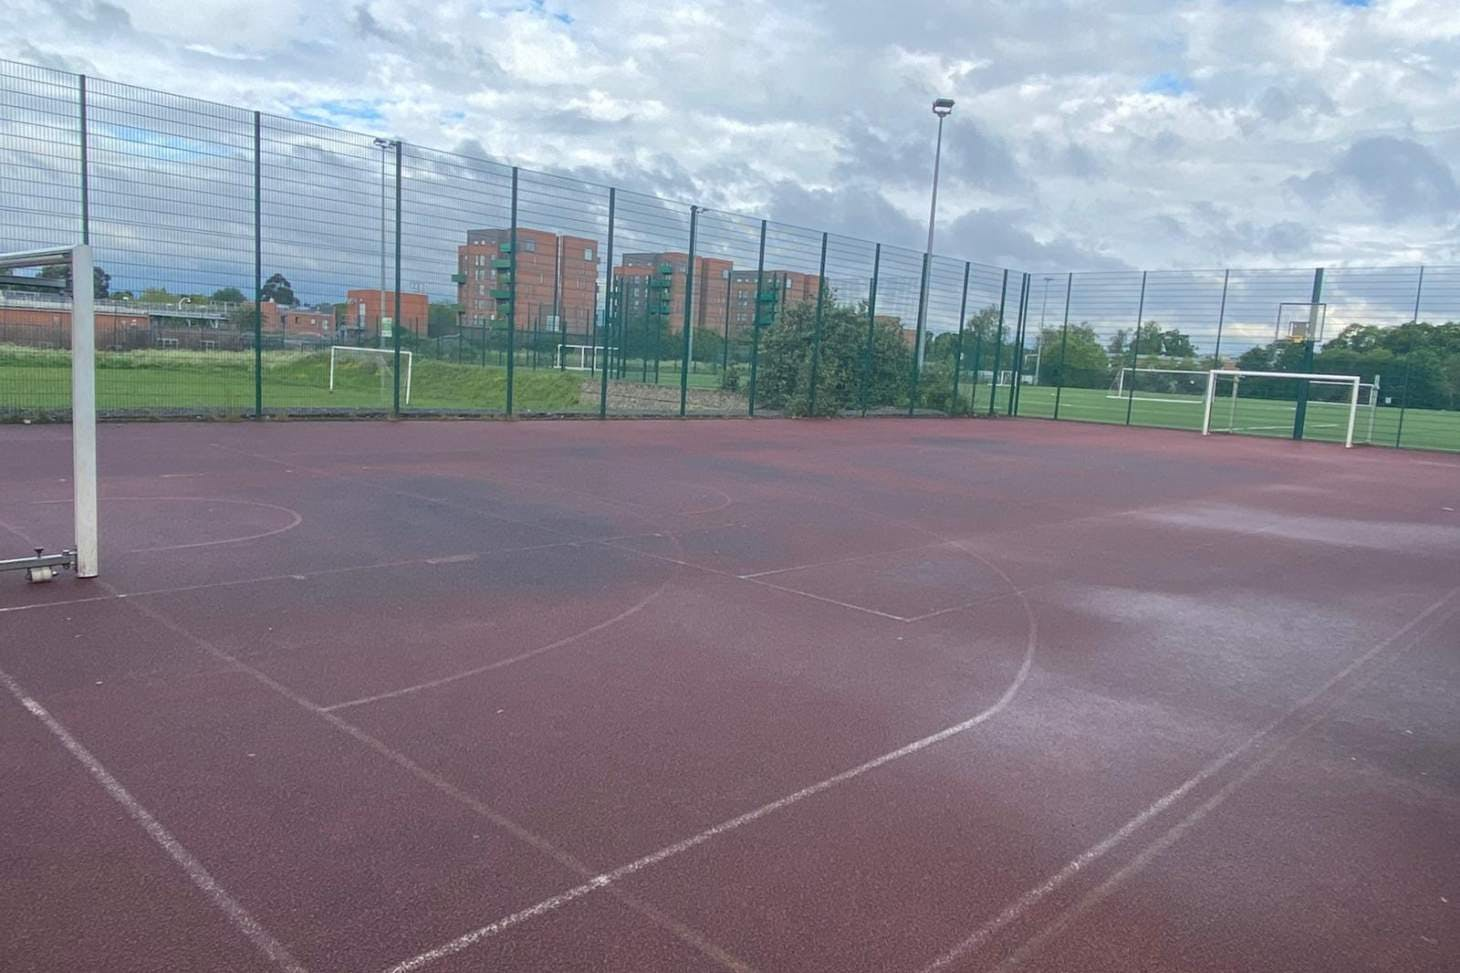 Ark Academy Wembley Outdoor | Hard (macadam) basketball court